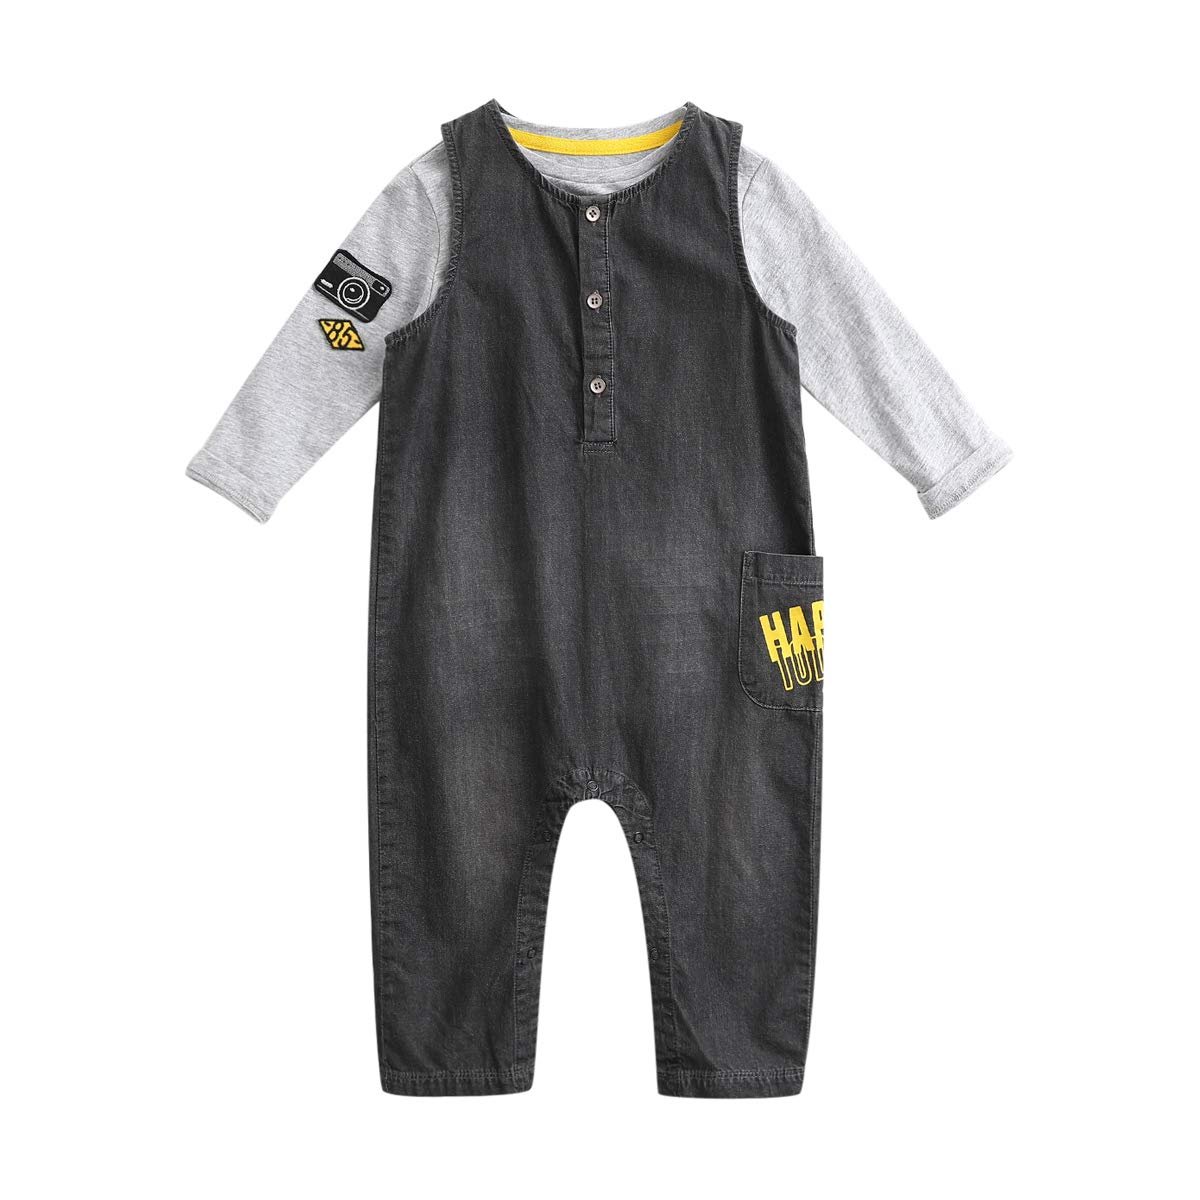 marc janie Little Boys' Autumn Denim Overalls and T Shirt Set Gray 24 Months (80 cm)